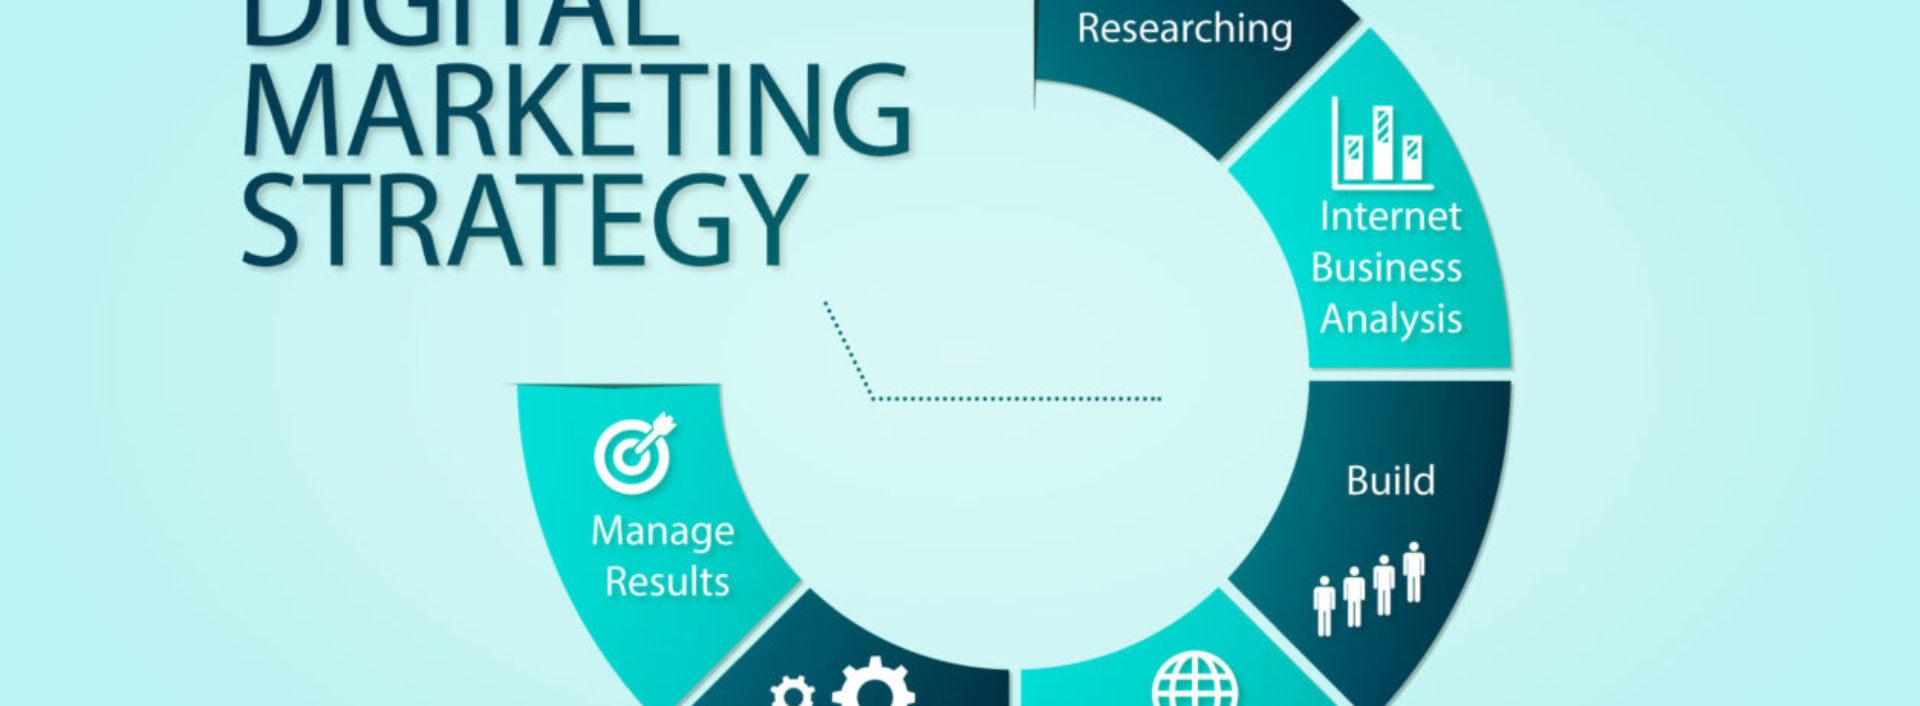 https://magicdesigns.co.za/wp-content/uploads/2018/03/Digital-Marketing-Strategy-Steps-e1541472599356-1920x706.jpg